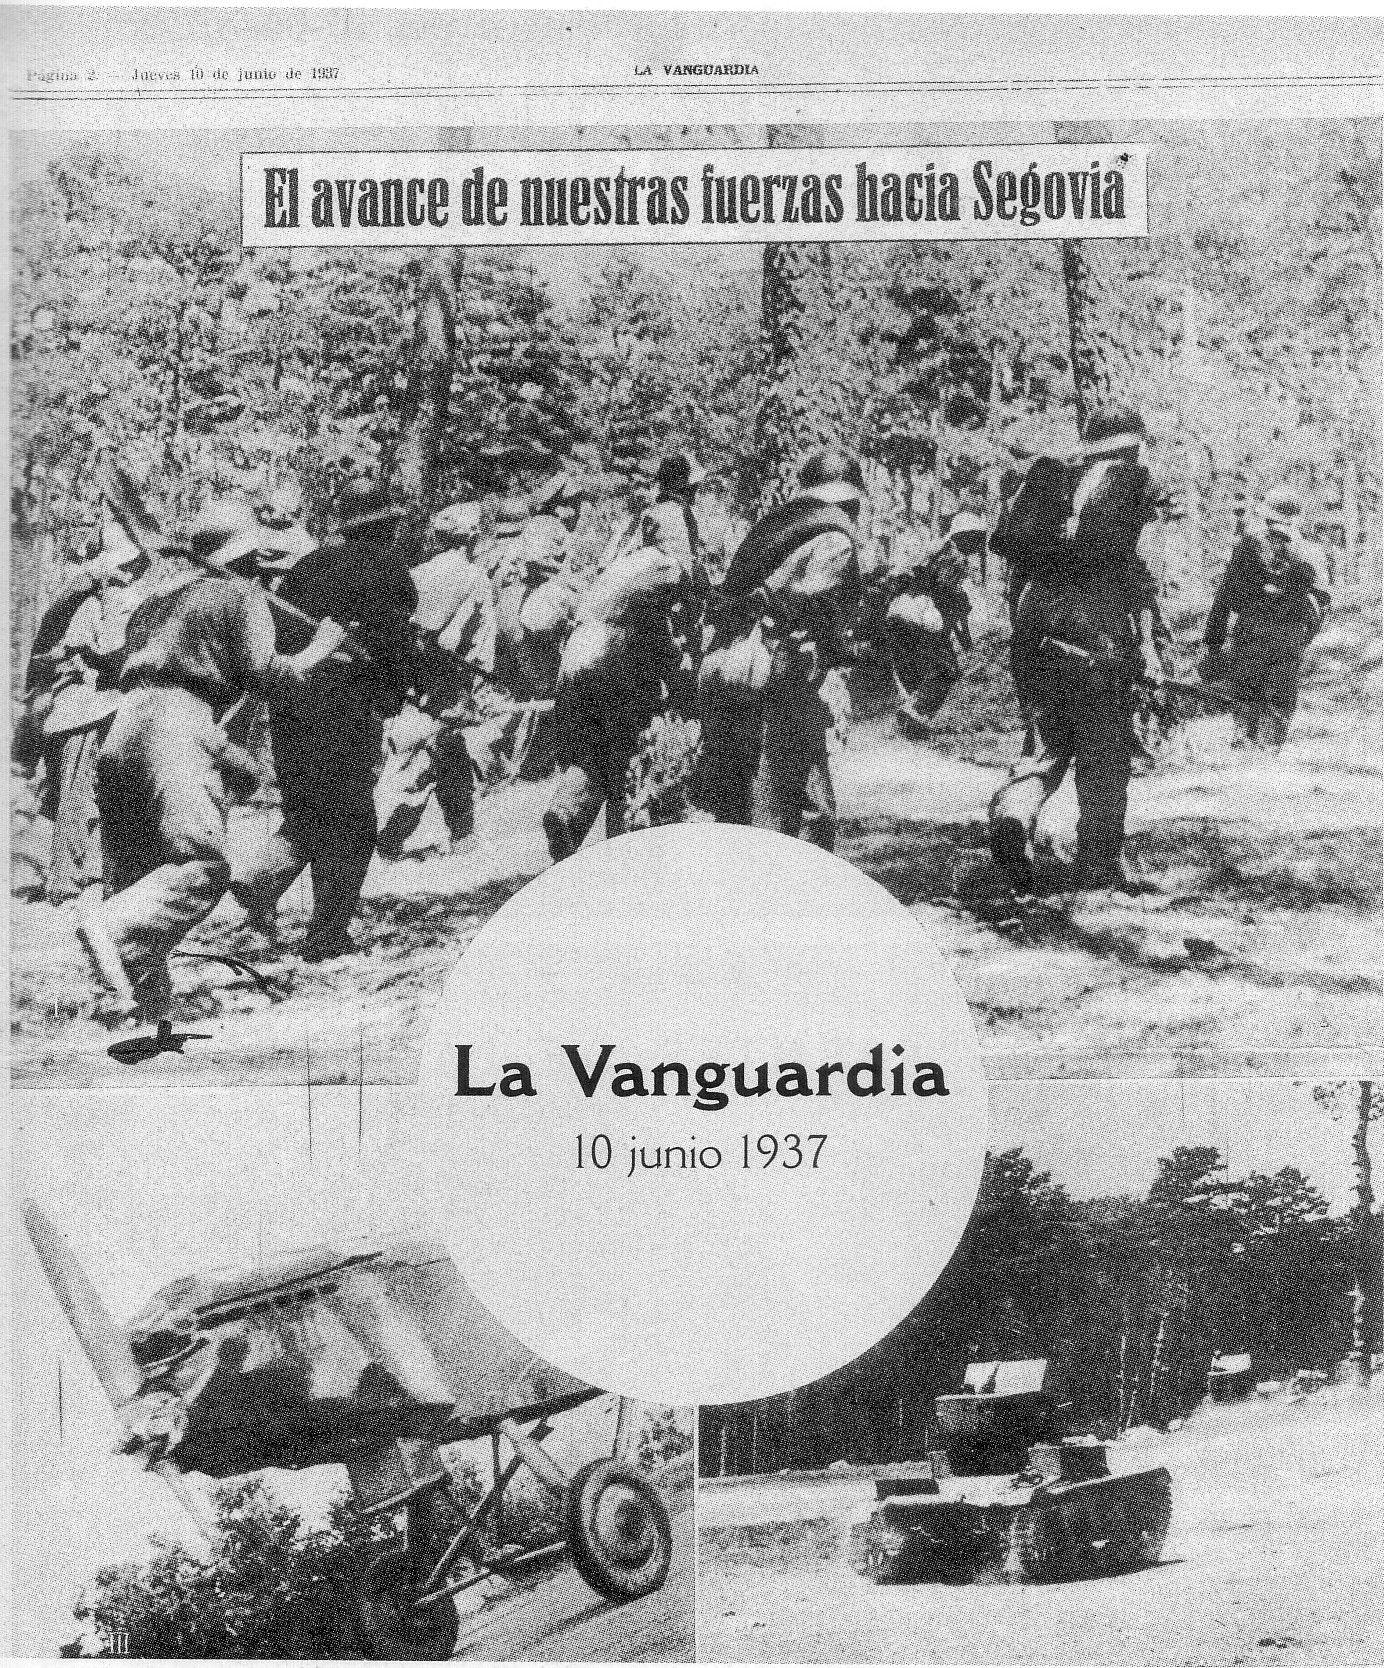 Ofensiva republicana sobre Segovia. La Vanguardia. Julio 1937 - II